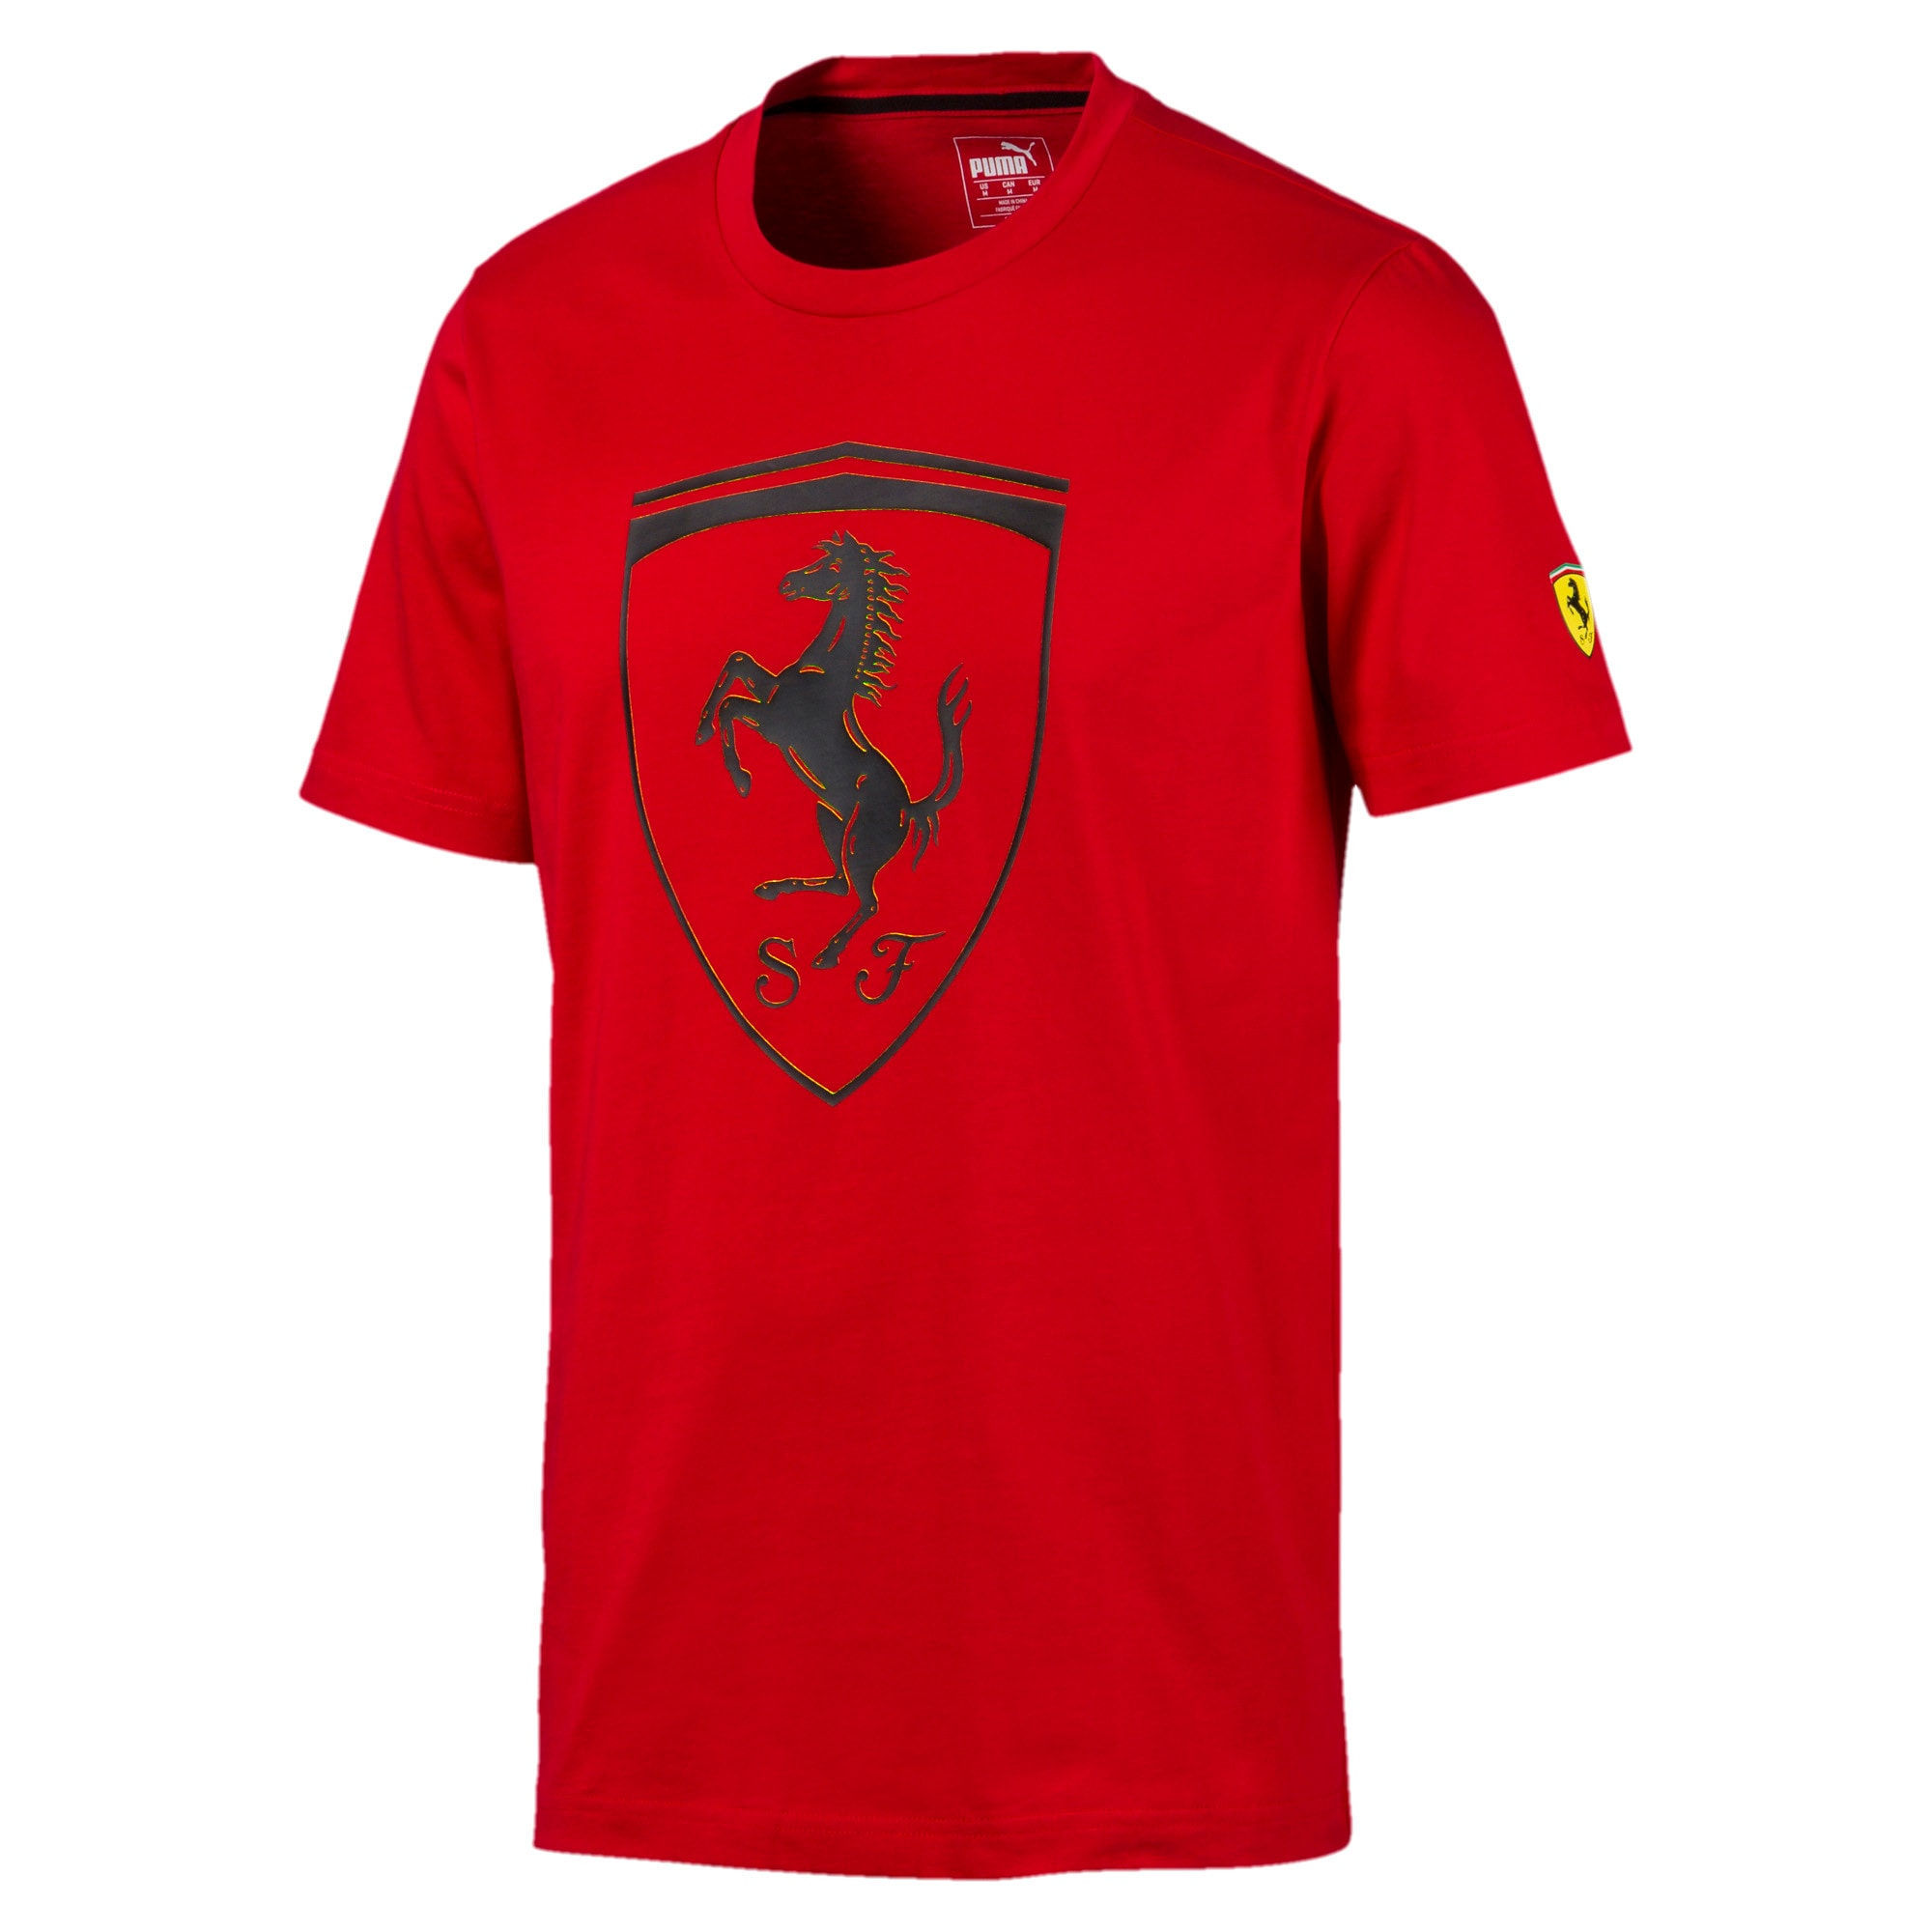 Thumbnail 4 of Ferrari Big Shield Men's Tee, Rosso Corsa, medium